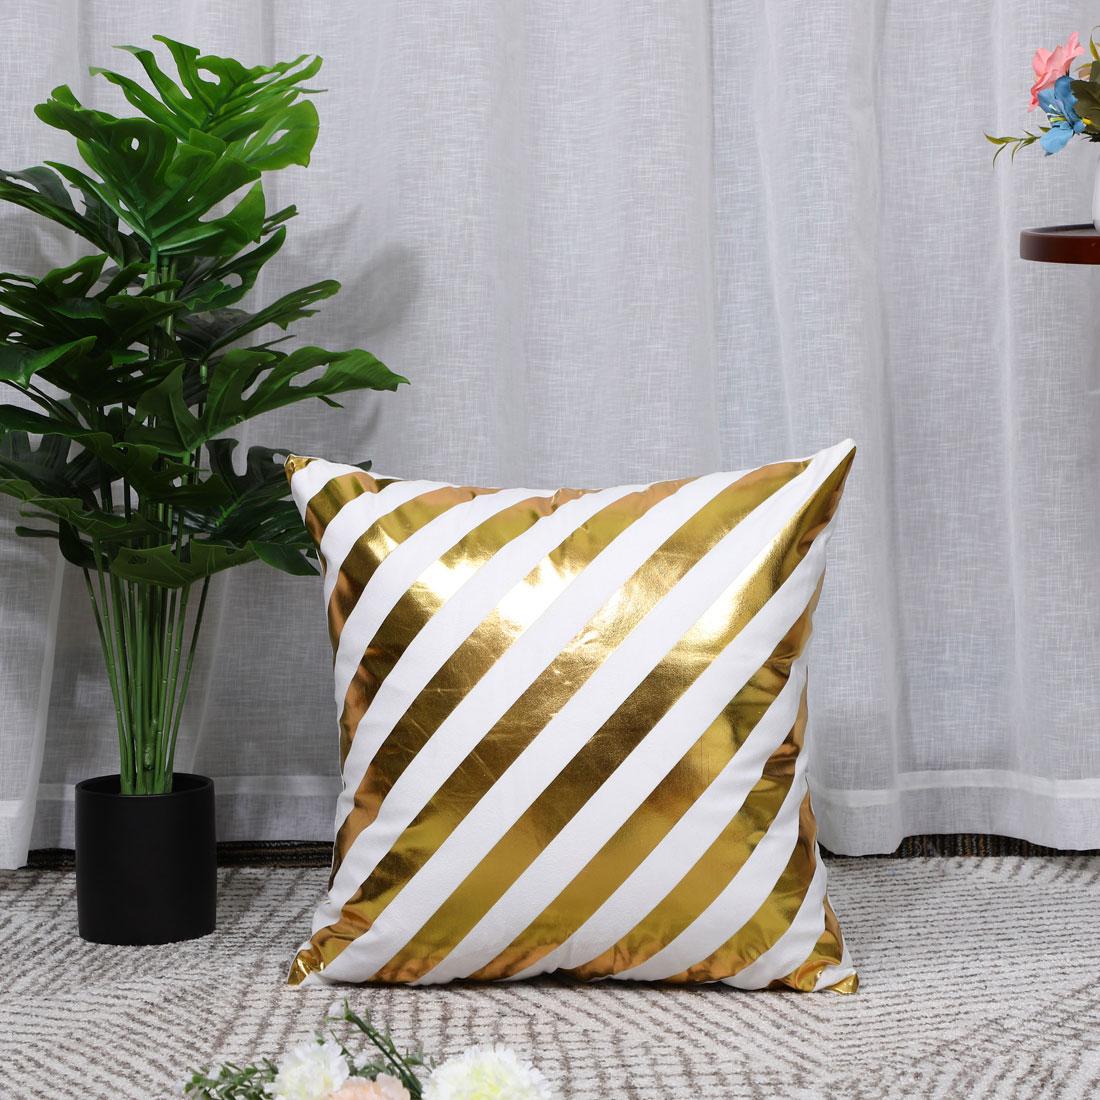 Decoration-Pillow-Covers-Cotton-Linen-Throw-Pillow-Case-Cushion-Cover thumbnail 48